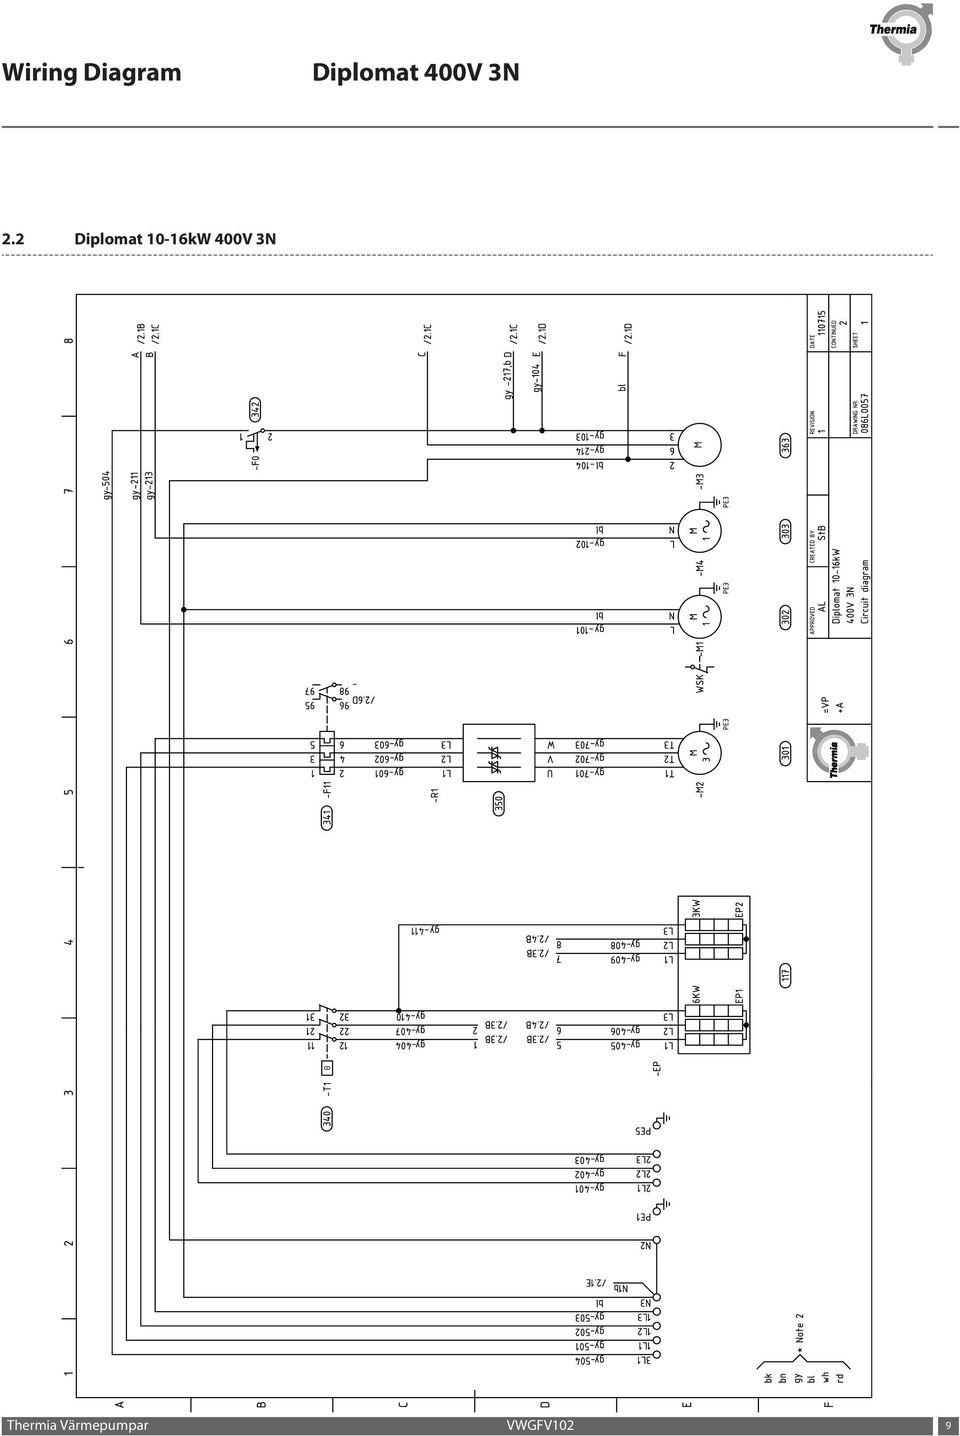 [DIAGRAM_34OR]  FZ_6742] Optimum Wiring Diagrams Download Diagram | Optimum Wiring Diagrams |  | Terch Ogram Benkeme Mohammedshrine Librar Wiring 101